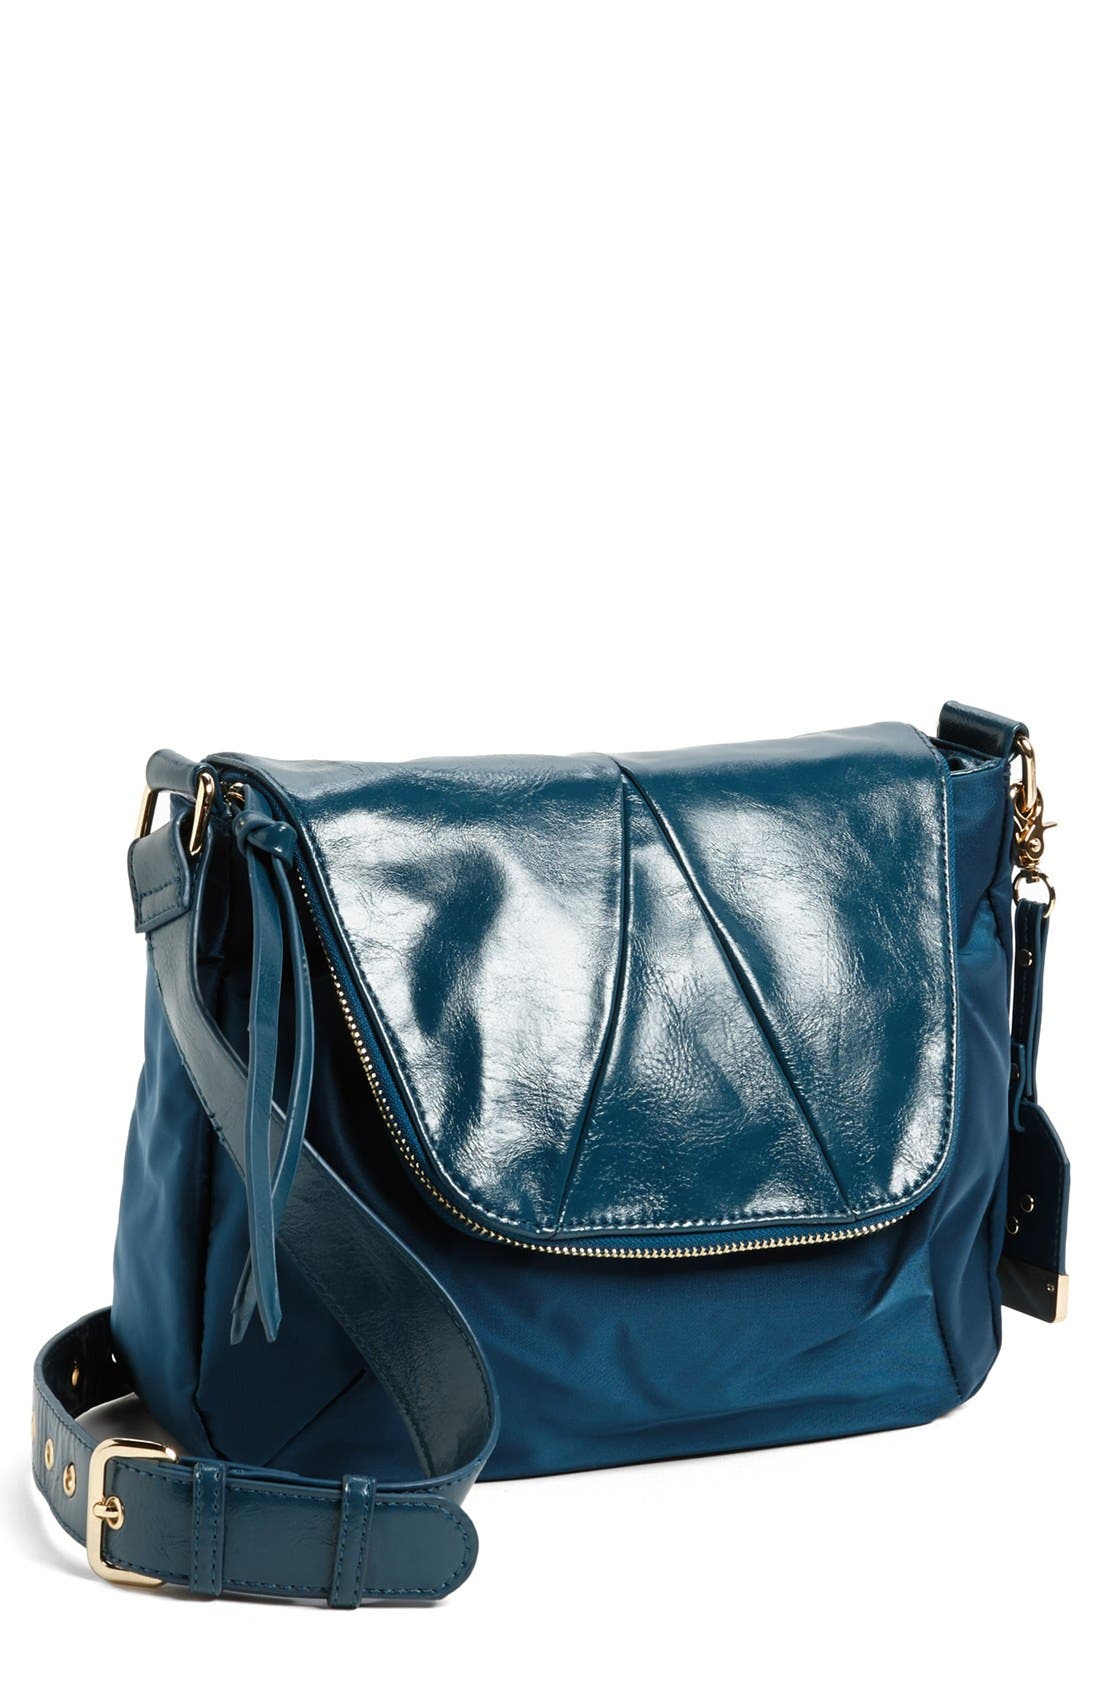 Alternate Image 1 Selected - POVERTY FLATS by rian Nylon Crossbody Bag